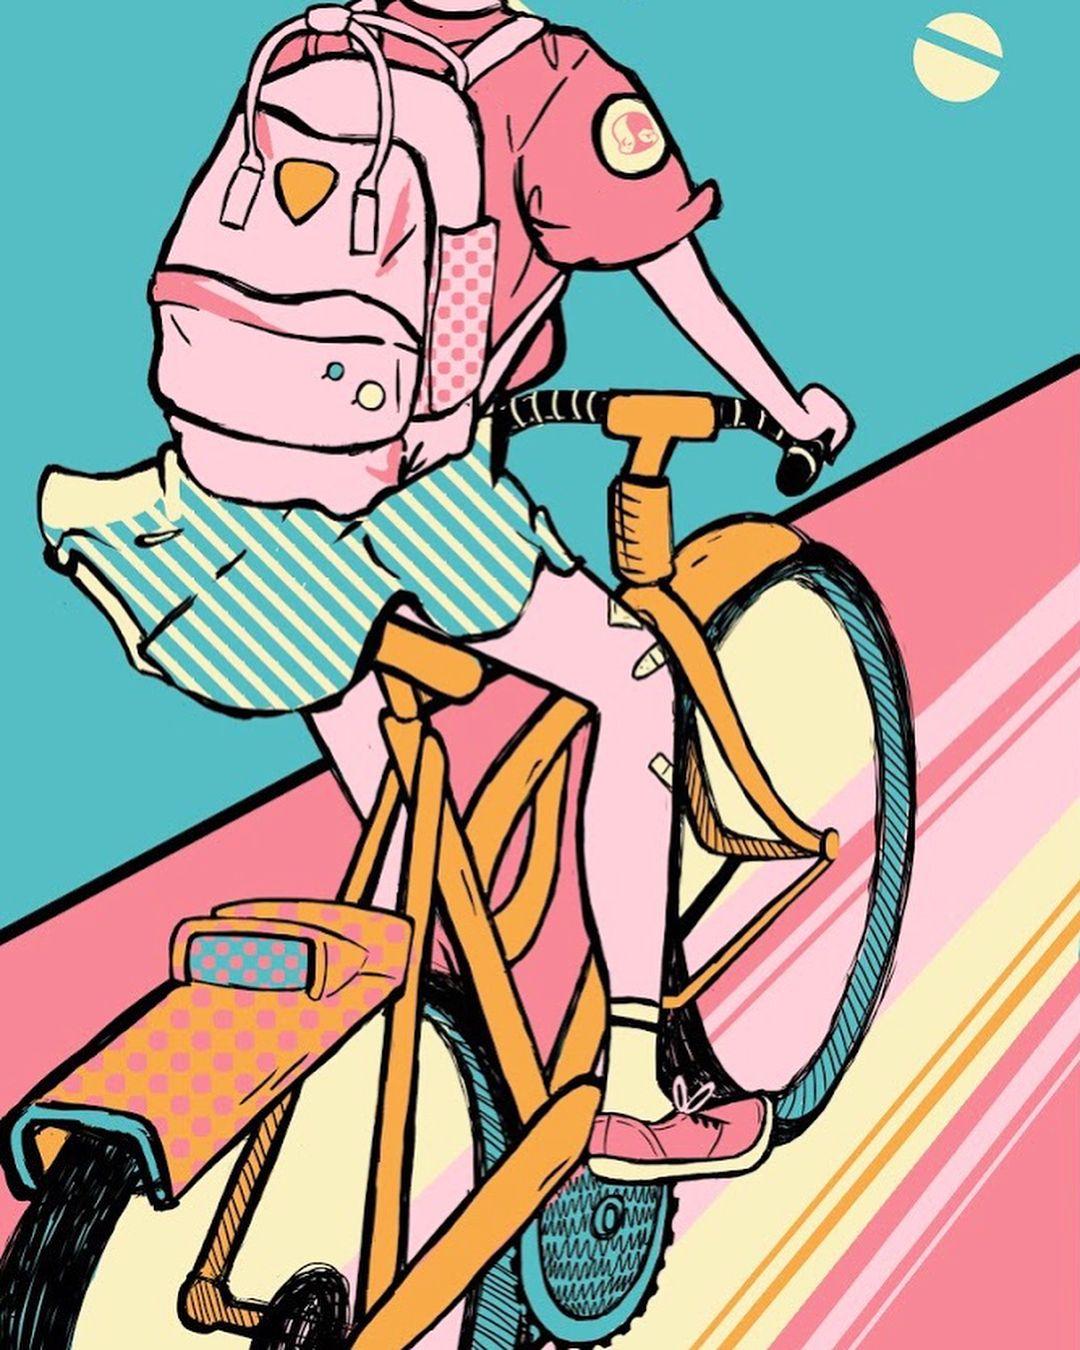 𝘴𝘩𝘦 𝘪𝘴 𝘴𝘶𝘮𝘮𝘦𝘳. apari art apparel summer girl anime